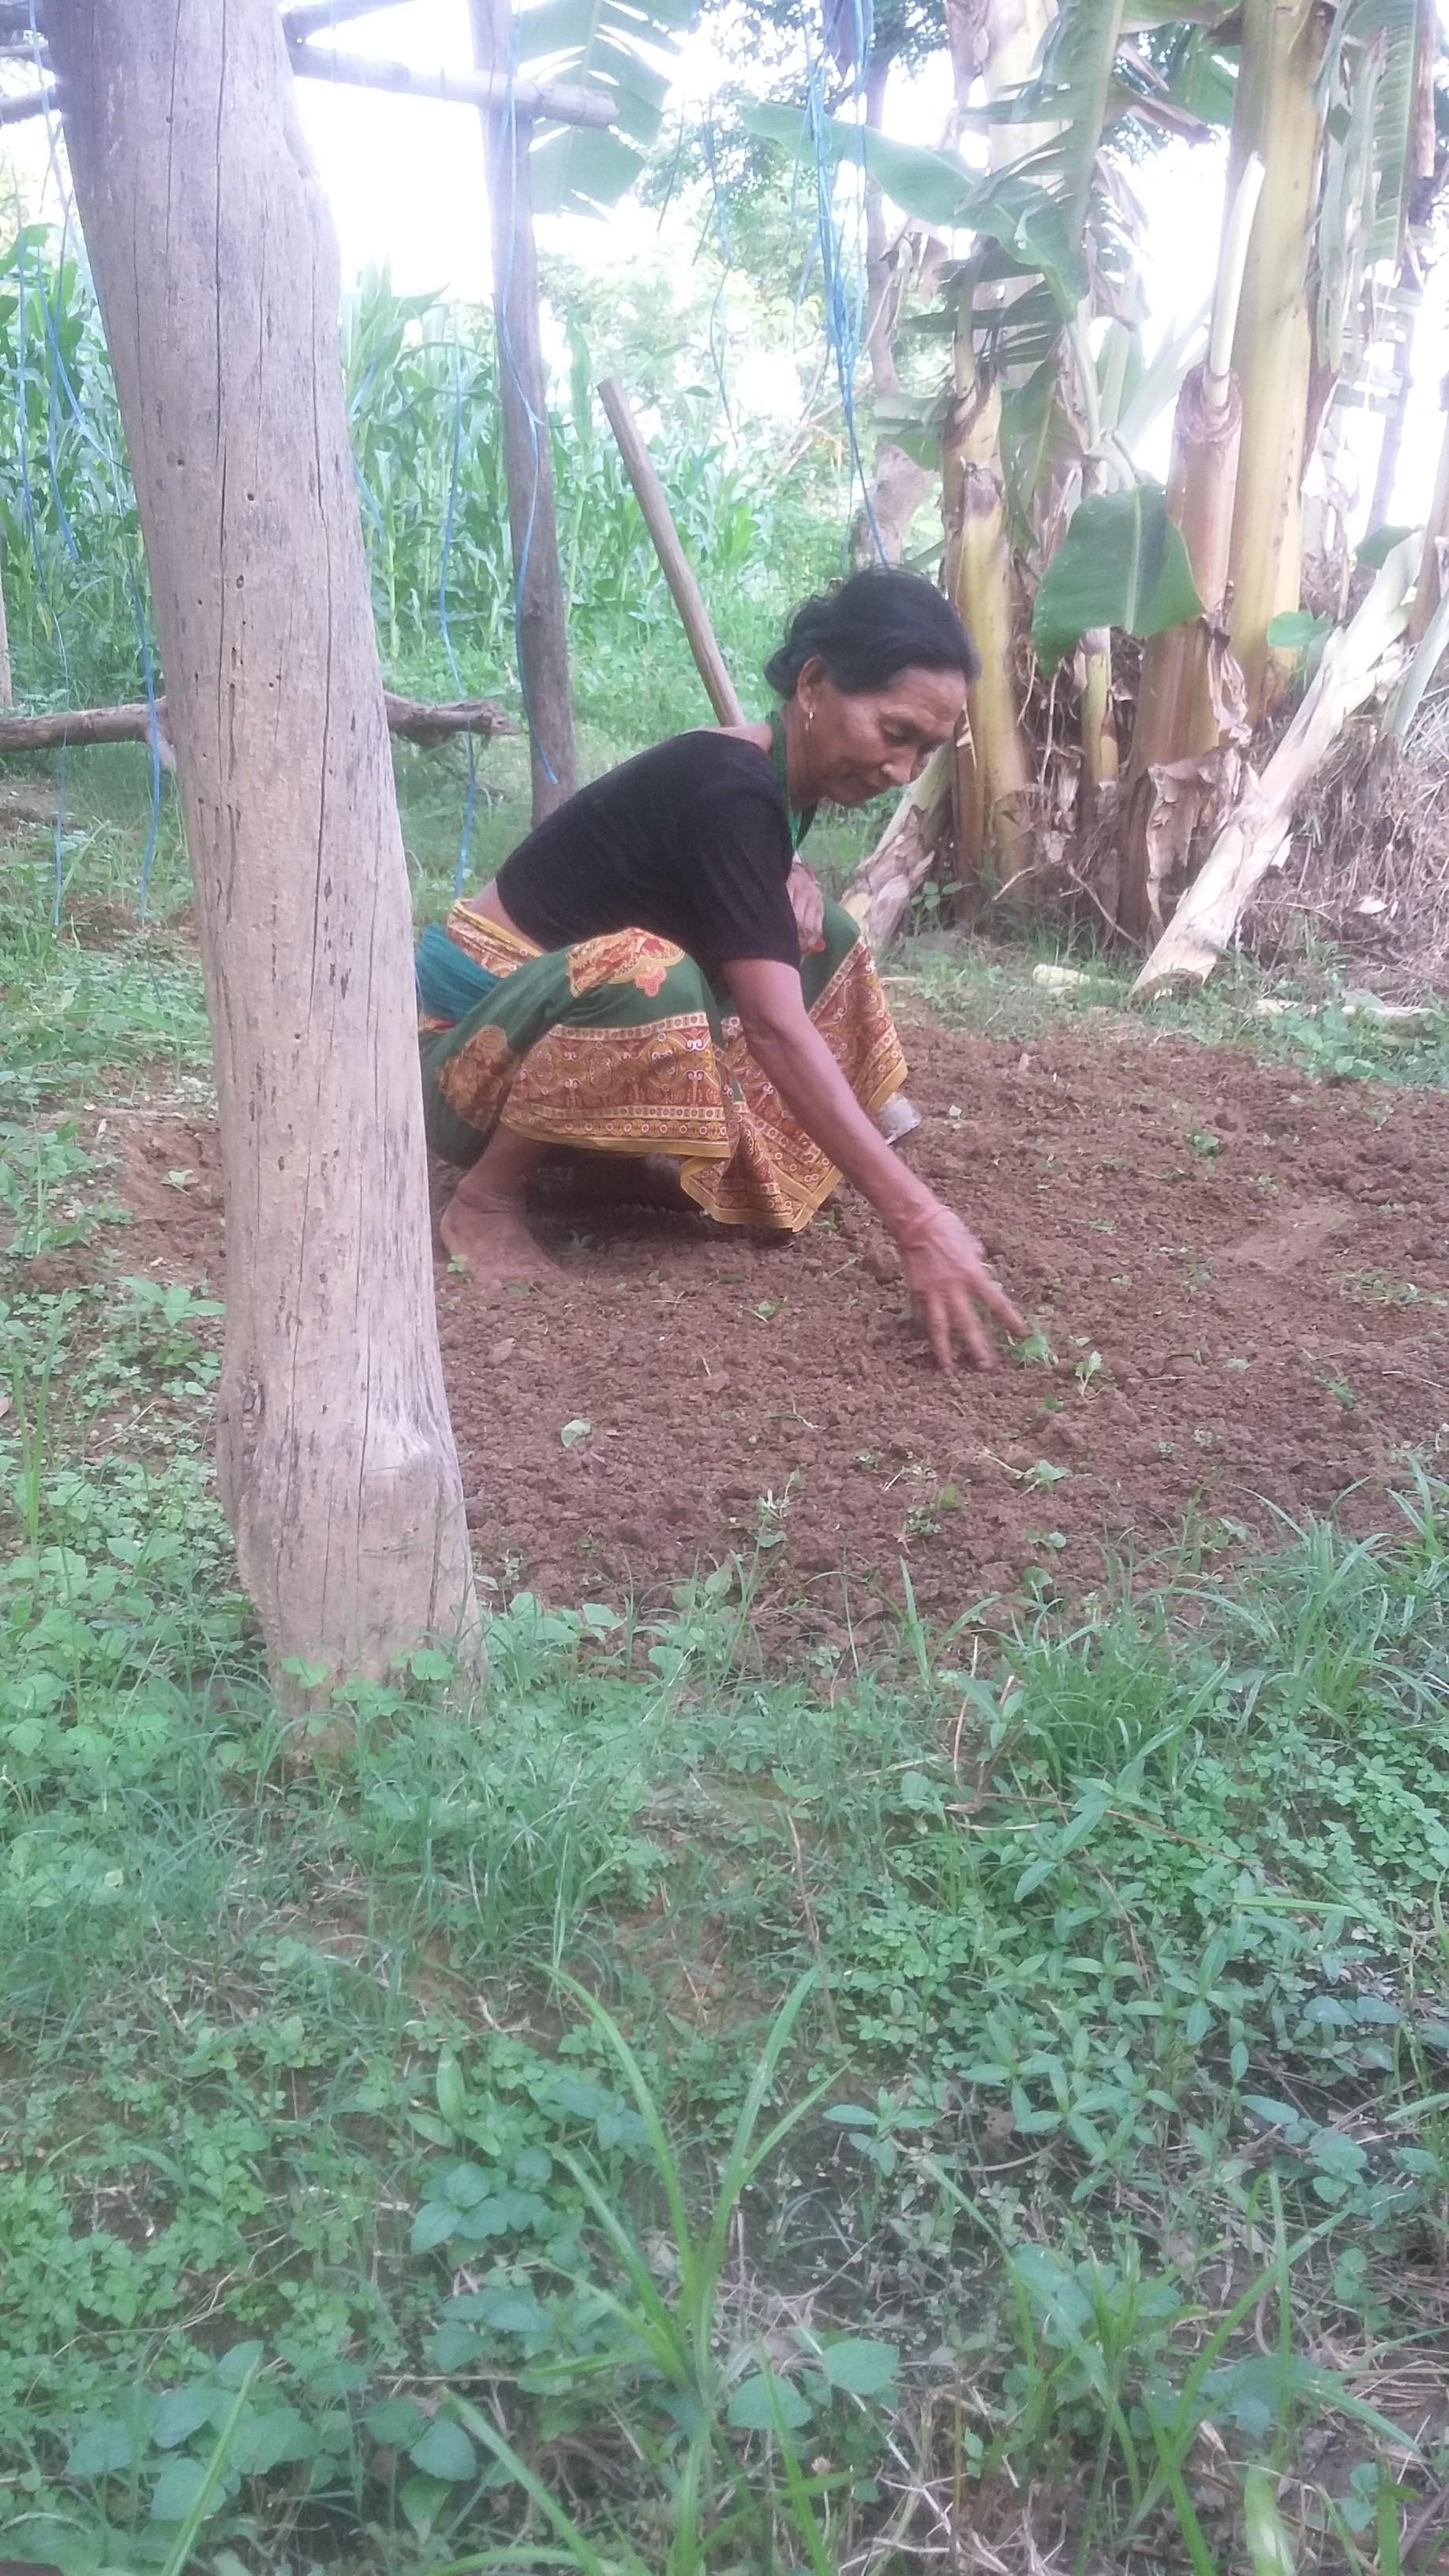 Tej Kumari Thada tending seedlings on her farm in Dhahaba.